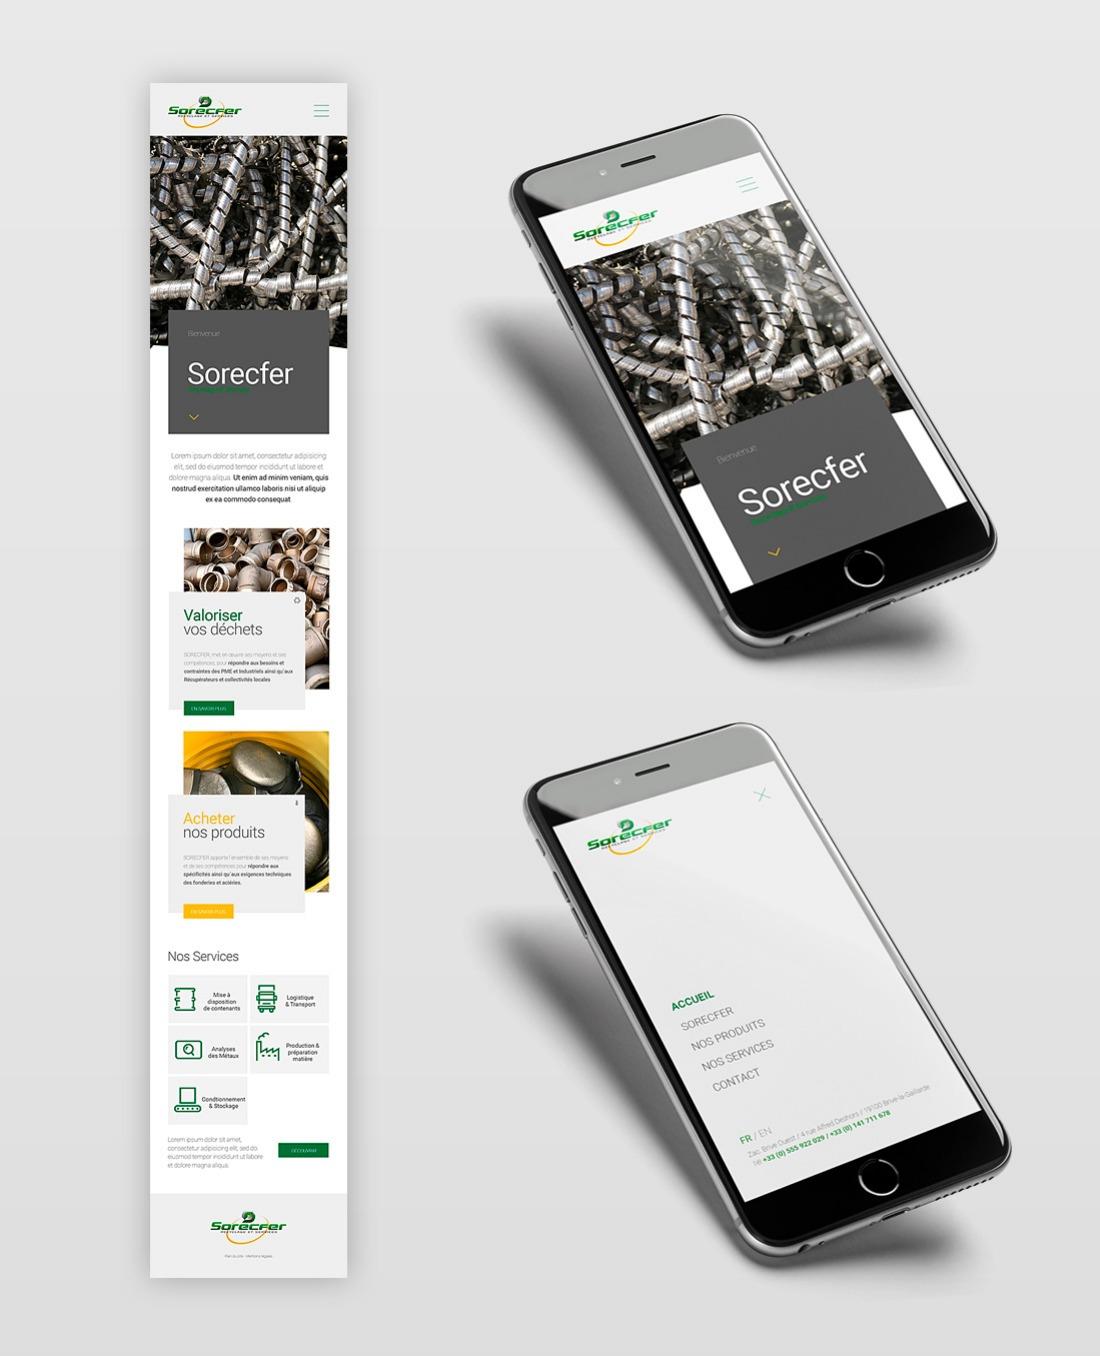 Sorecfer recyclage - Bicom Studio